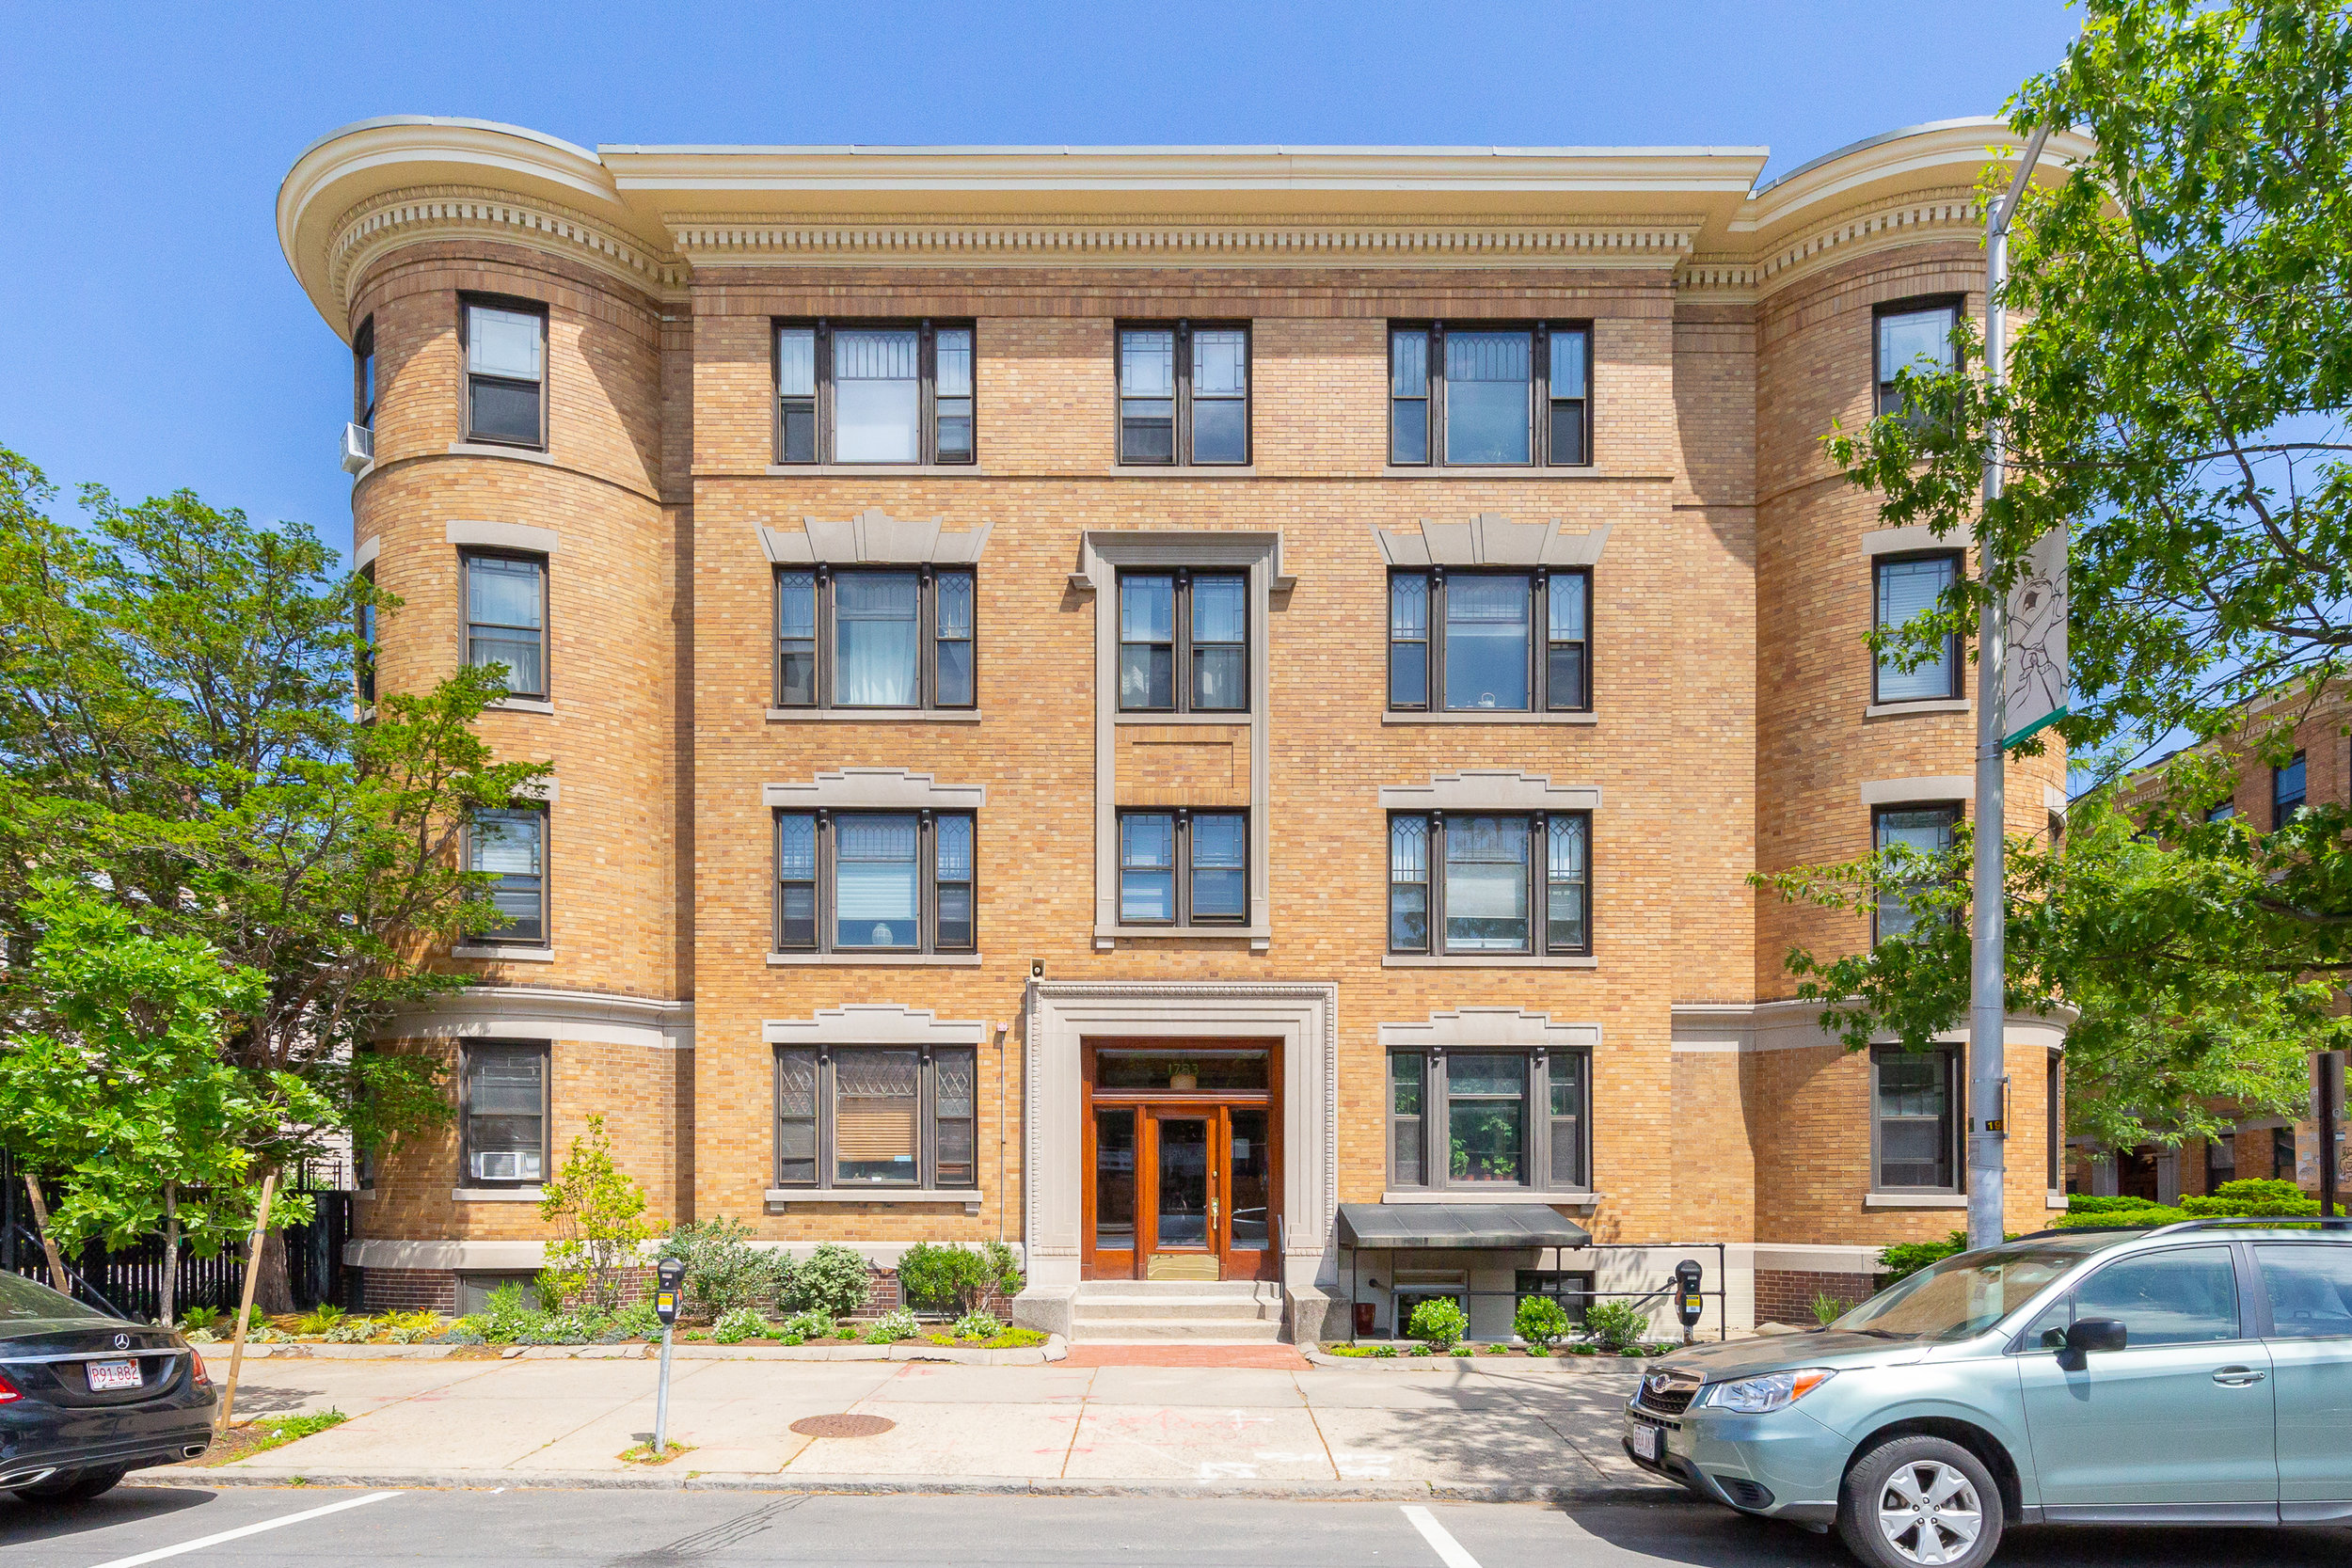 1783 Massachusetts Ave, Cambridge, MA_Property-Precision-4.jpg